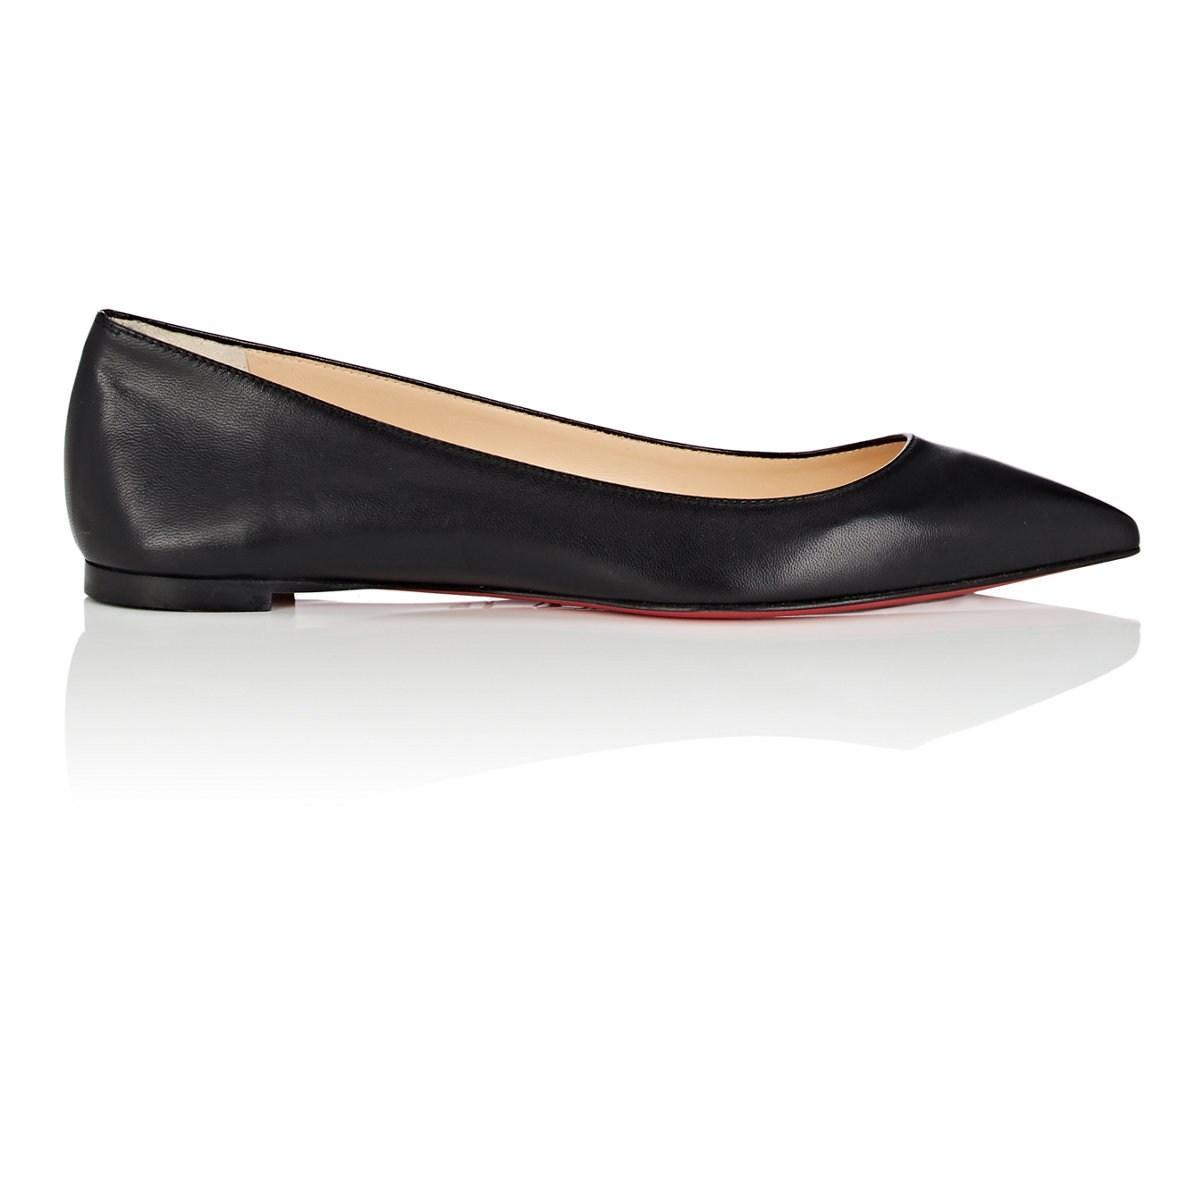 d9a29602513 Lyst - Christian Louboutin Ballalla Leather Flats in Black